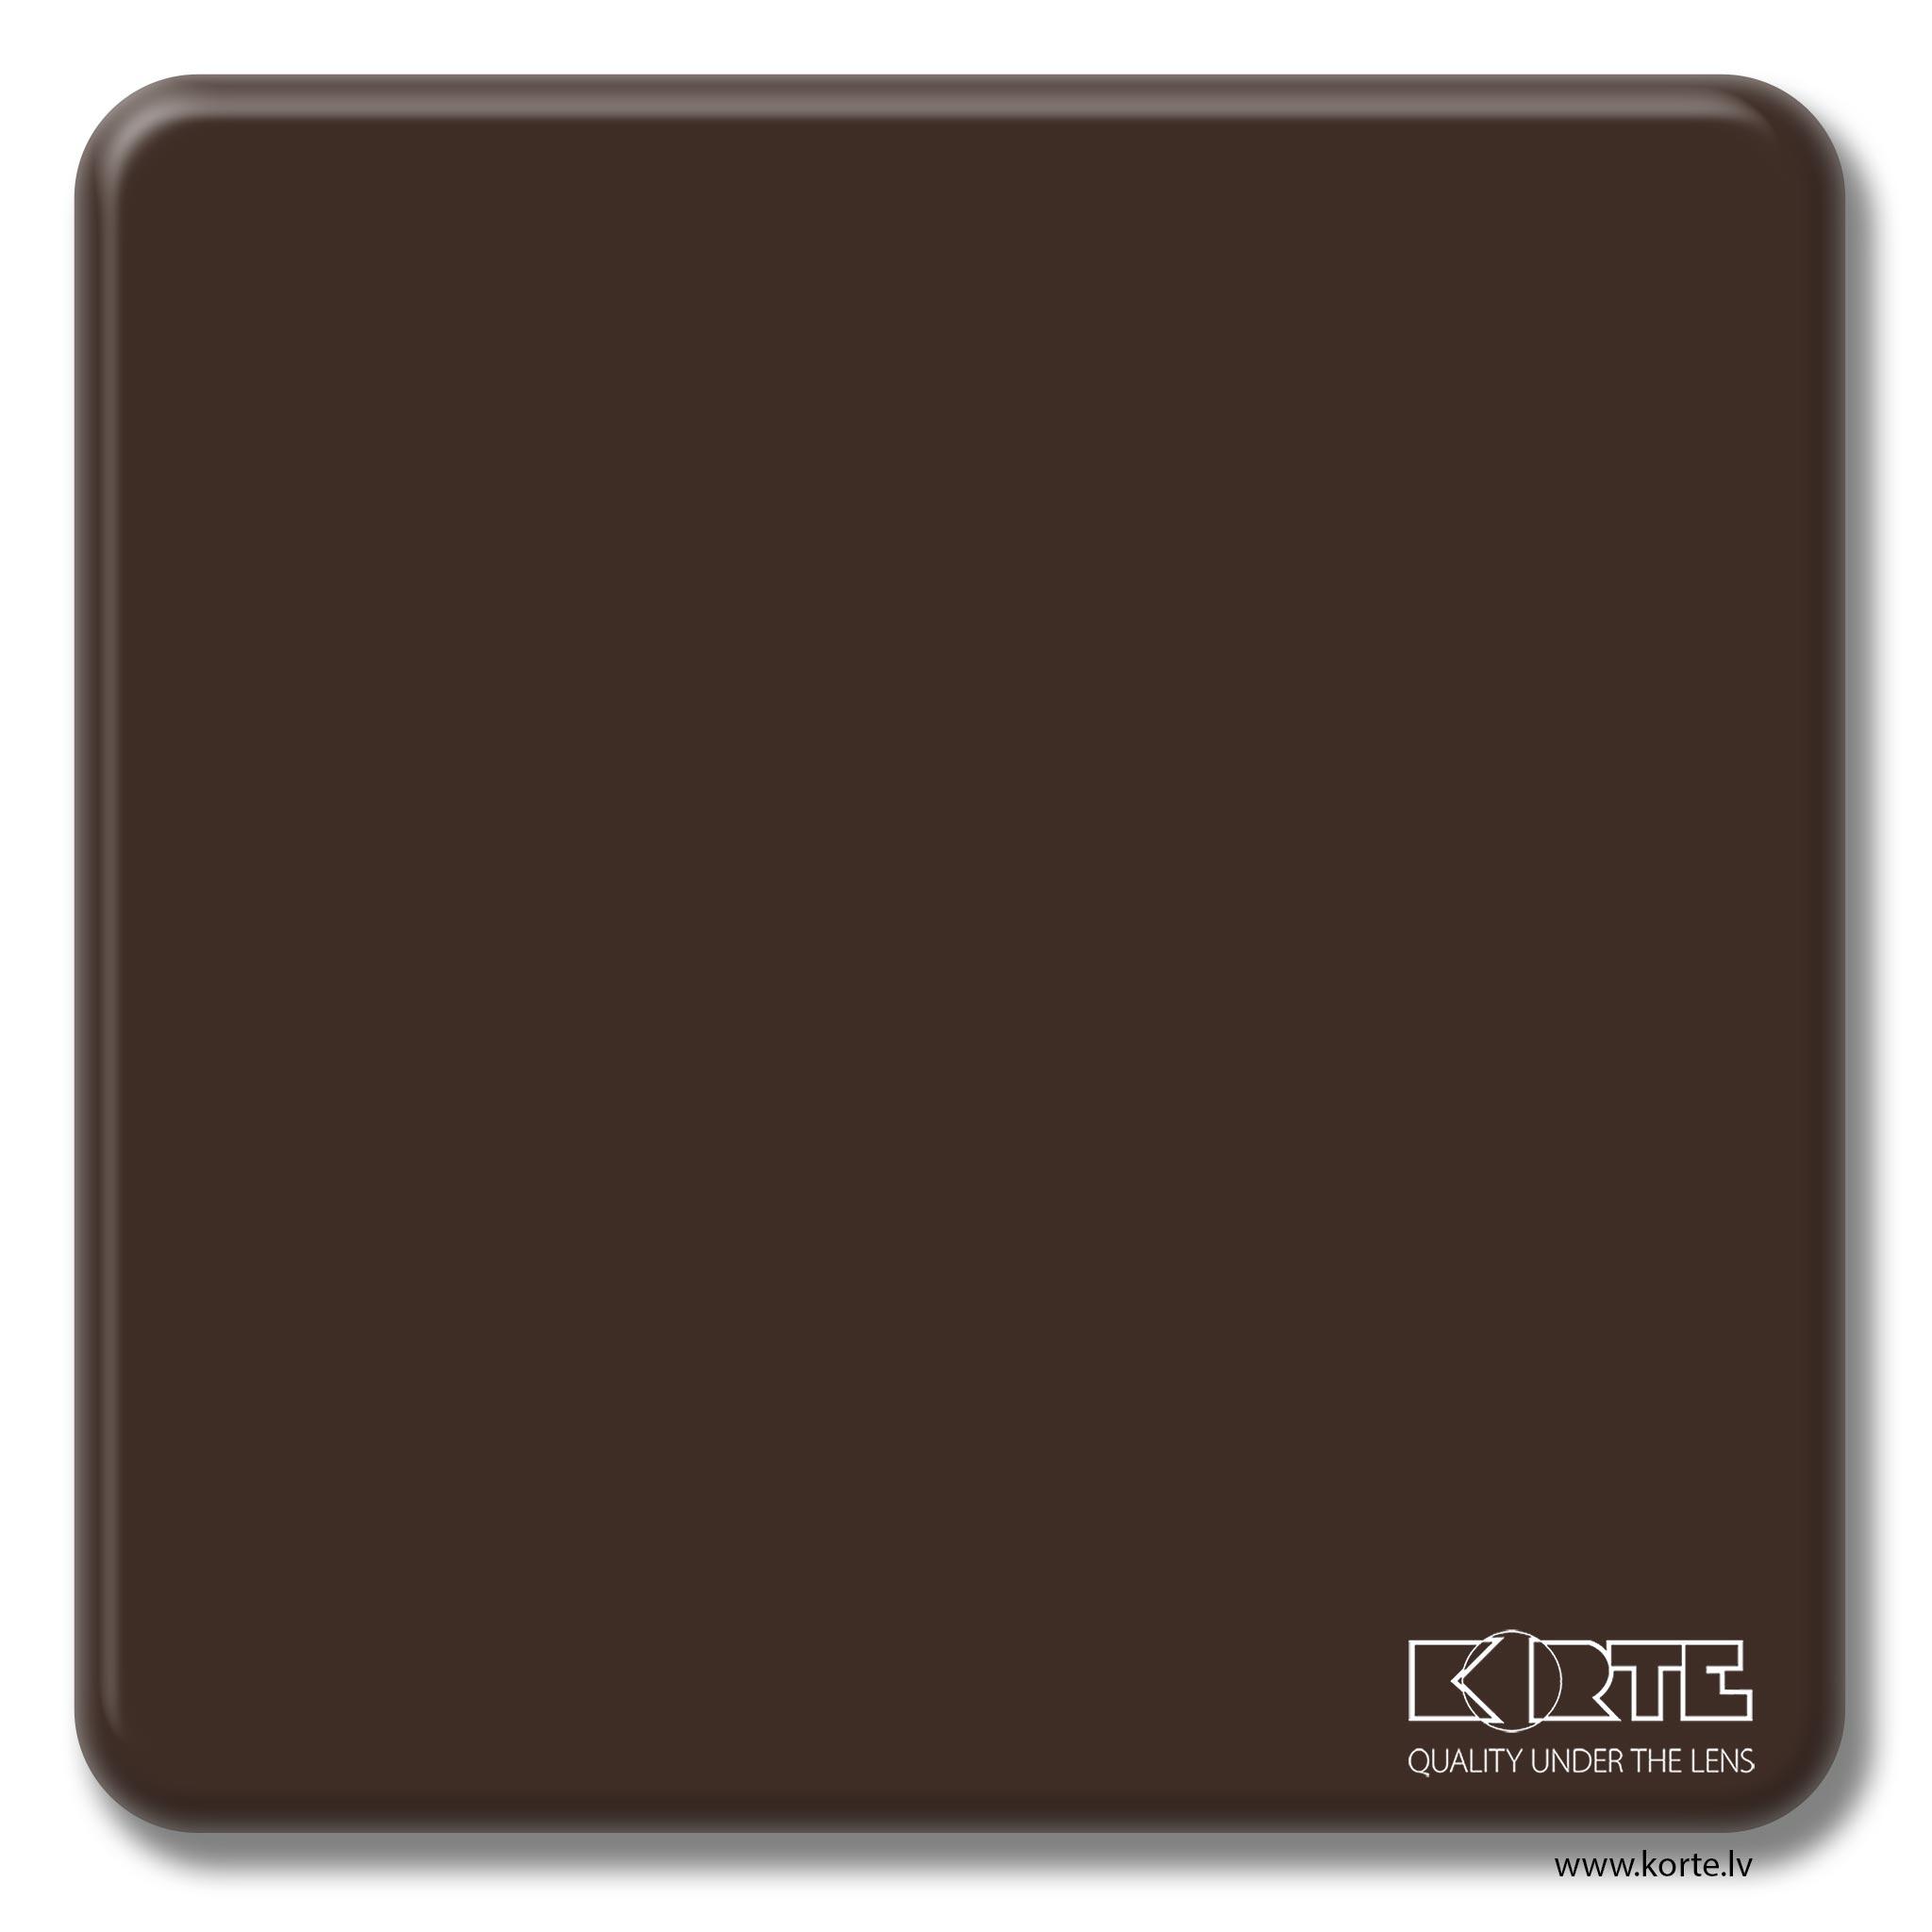 Lyric Chocolate